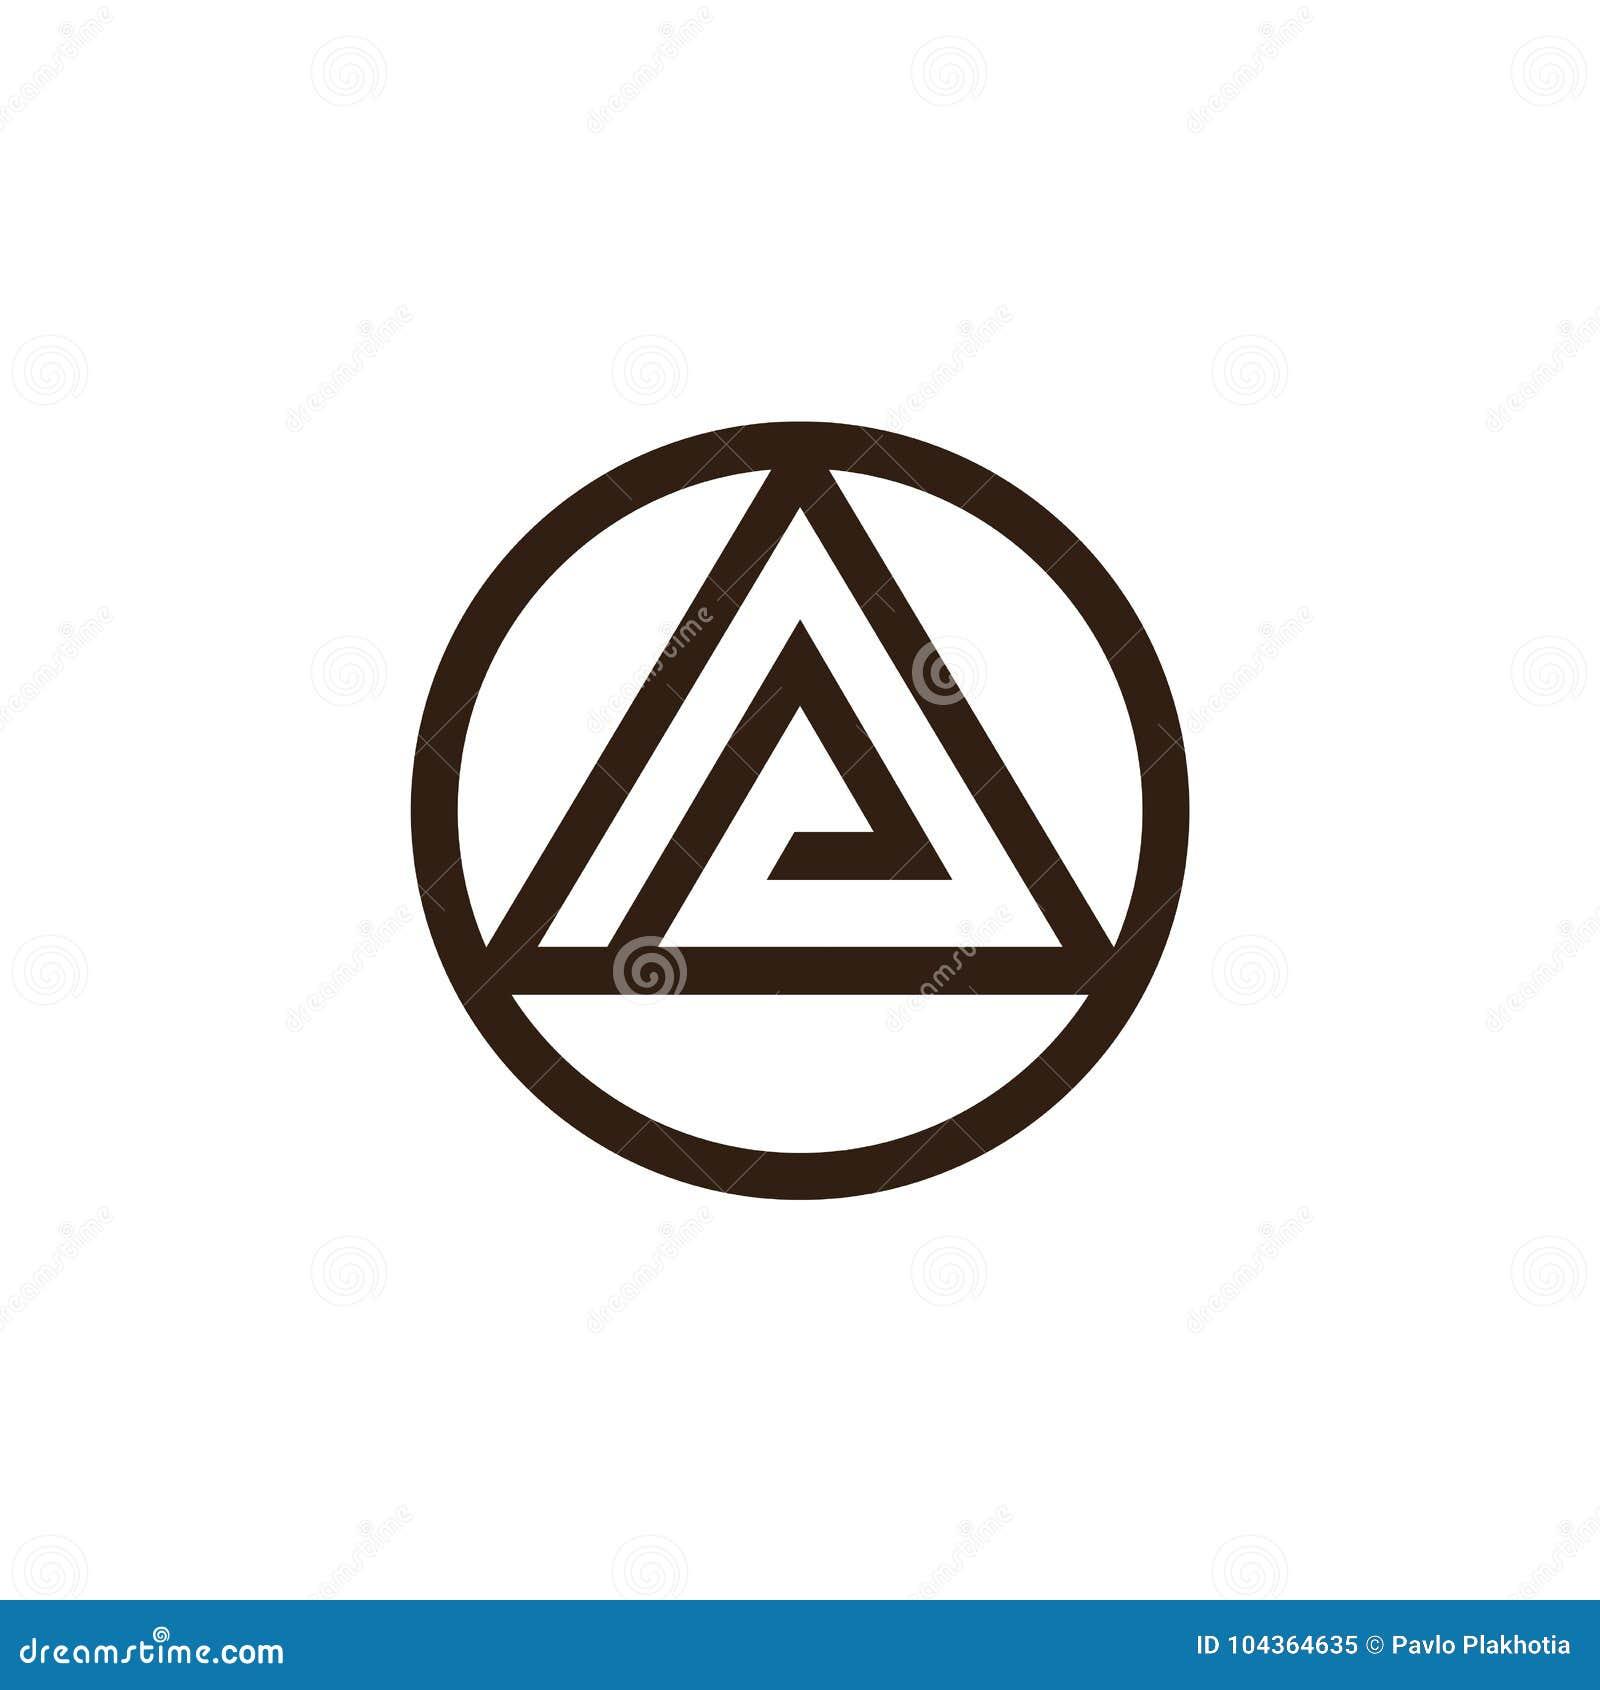 Triangle and circle logo design abstract letters o and a symbol triangle and circle logo design abstract letters o and a symbol combination vector illustration buycottarizona